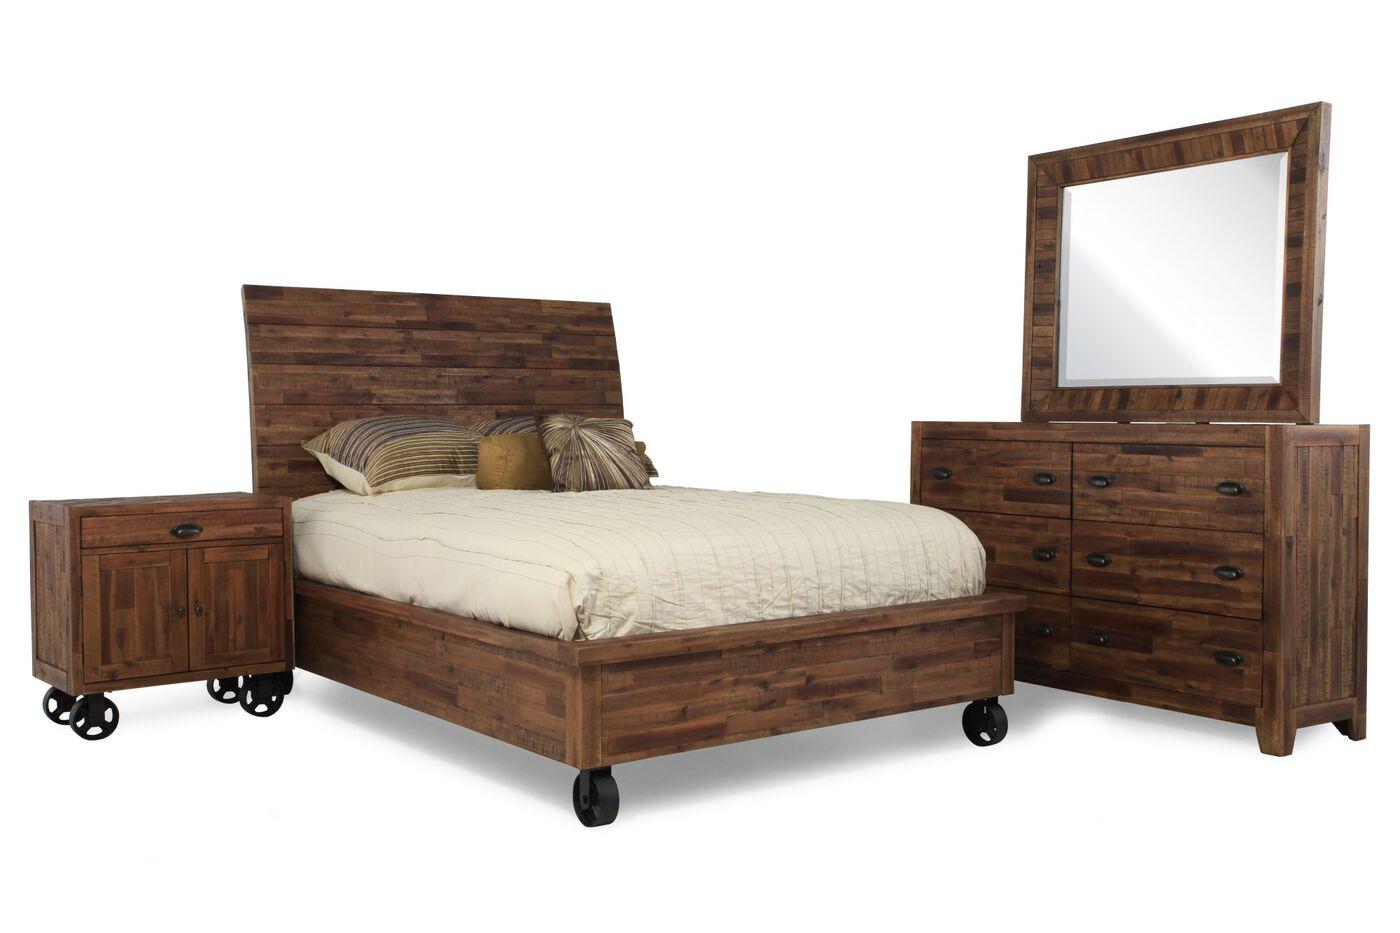 magnussen bedroom furniture. Four Piece Country Bedroom Set in Dark Brown  Mathis Brothers